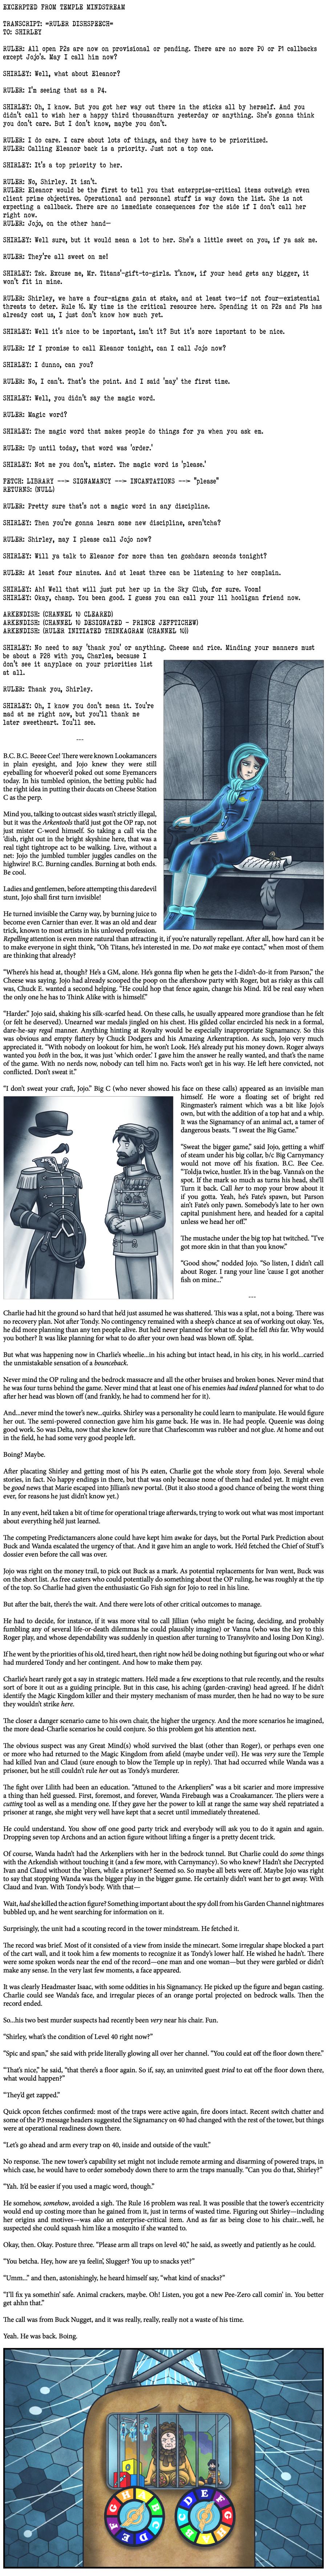 Comic - Book 4 - Page 145